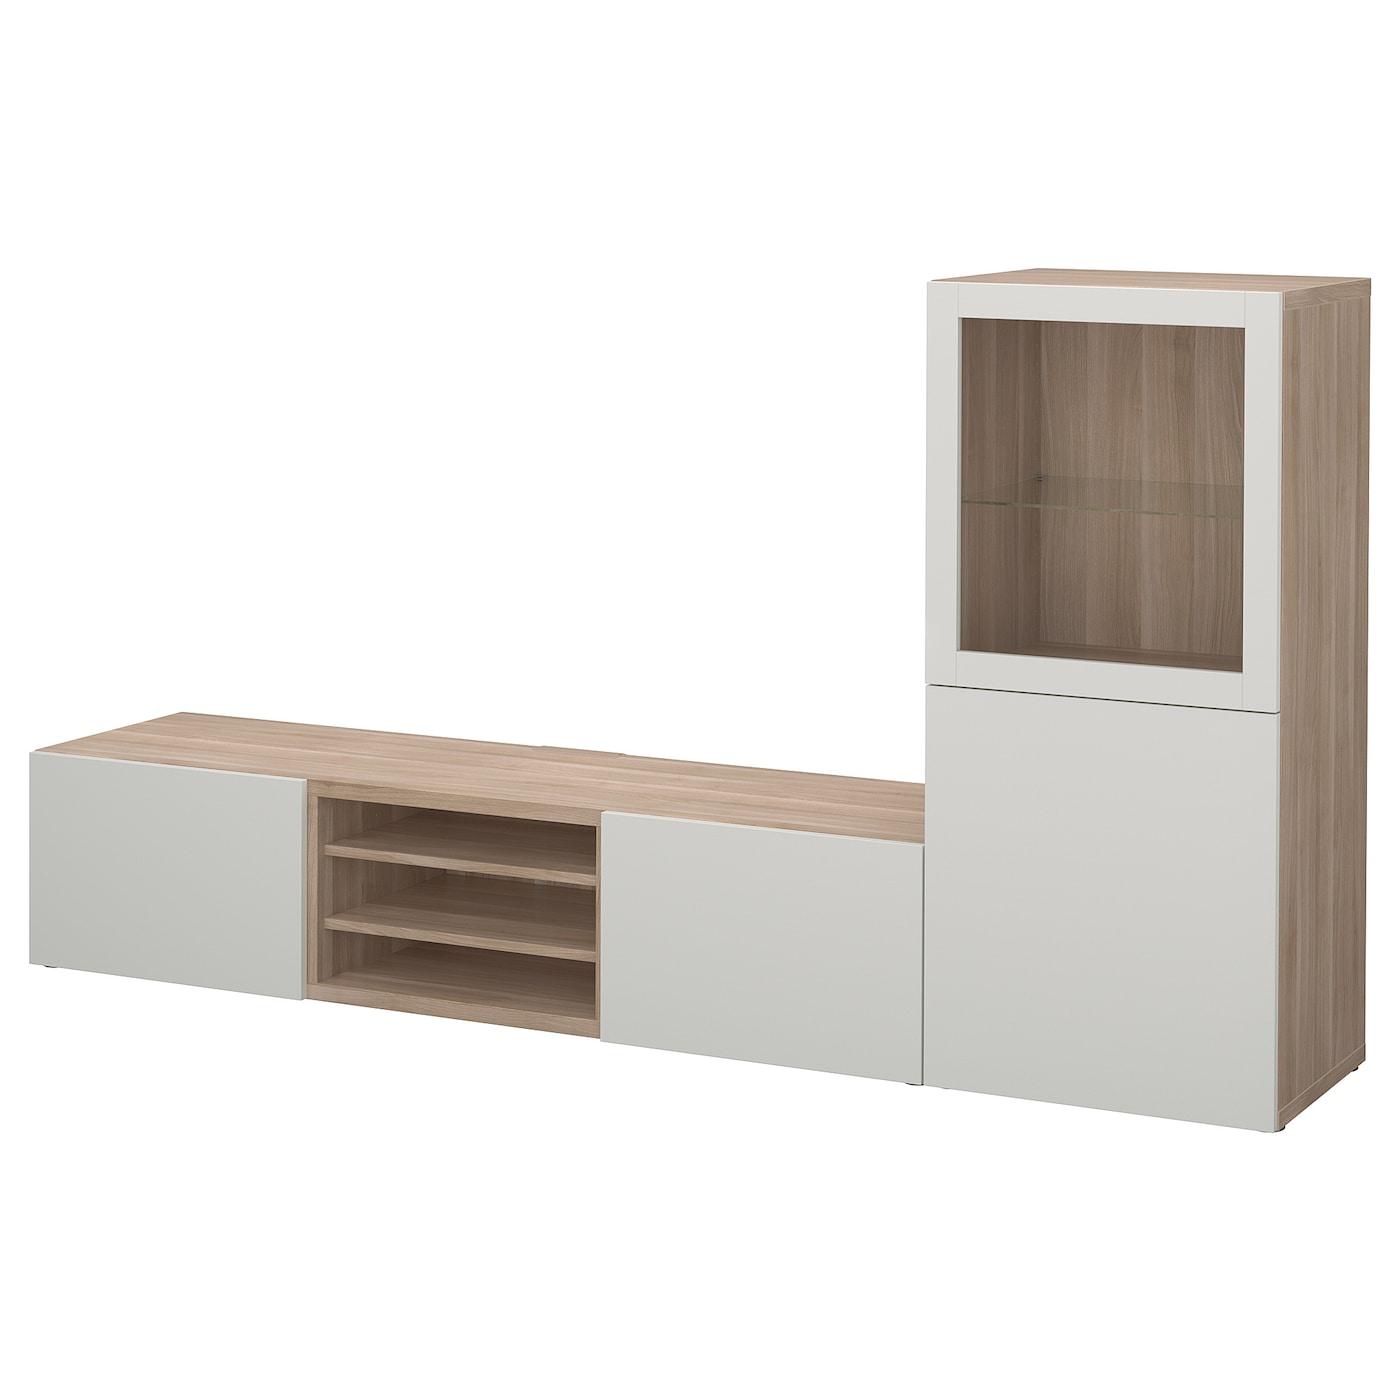 Best mueble tv con almacenaje efecto nogal tinte gris lappviken vidrio transparente gris claro - Muebles almacenaje ikea ...